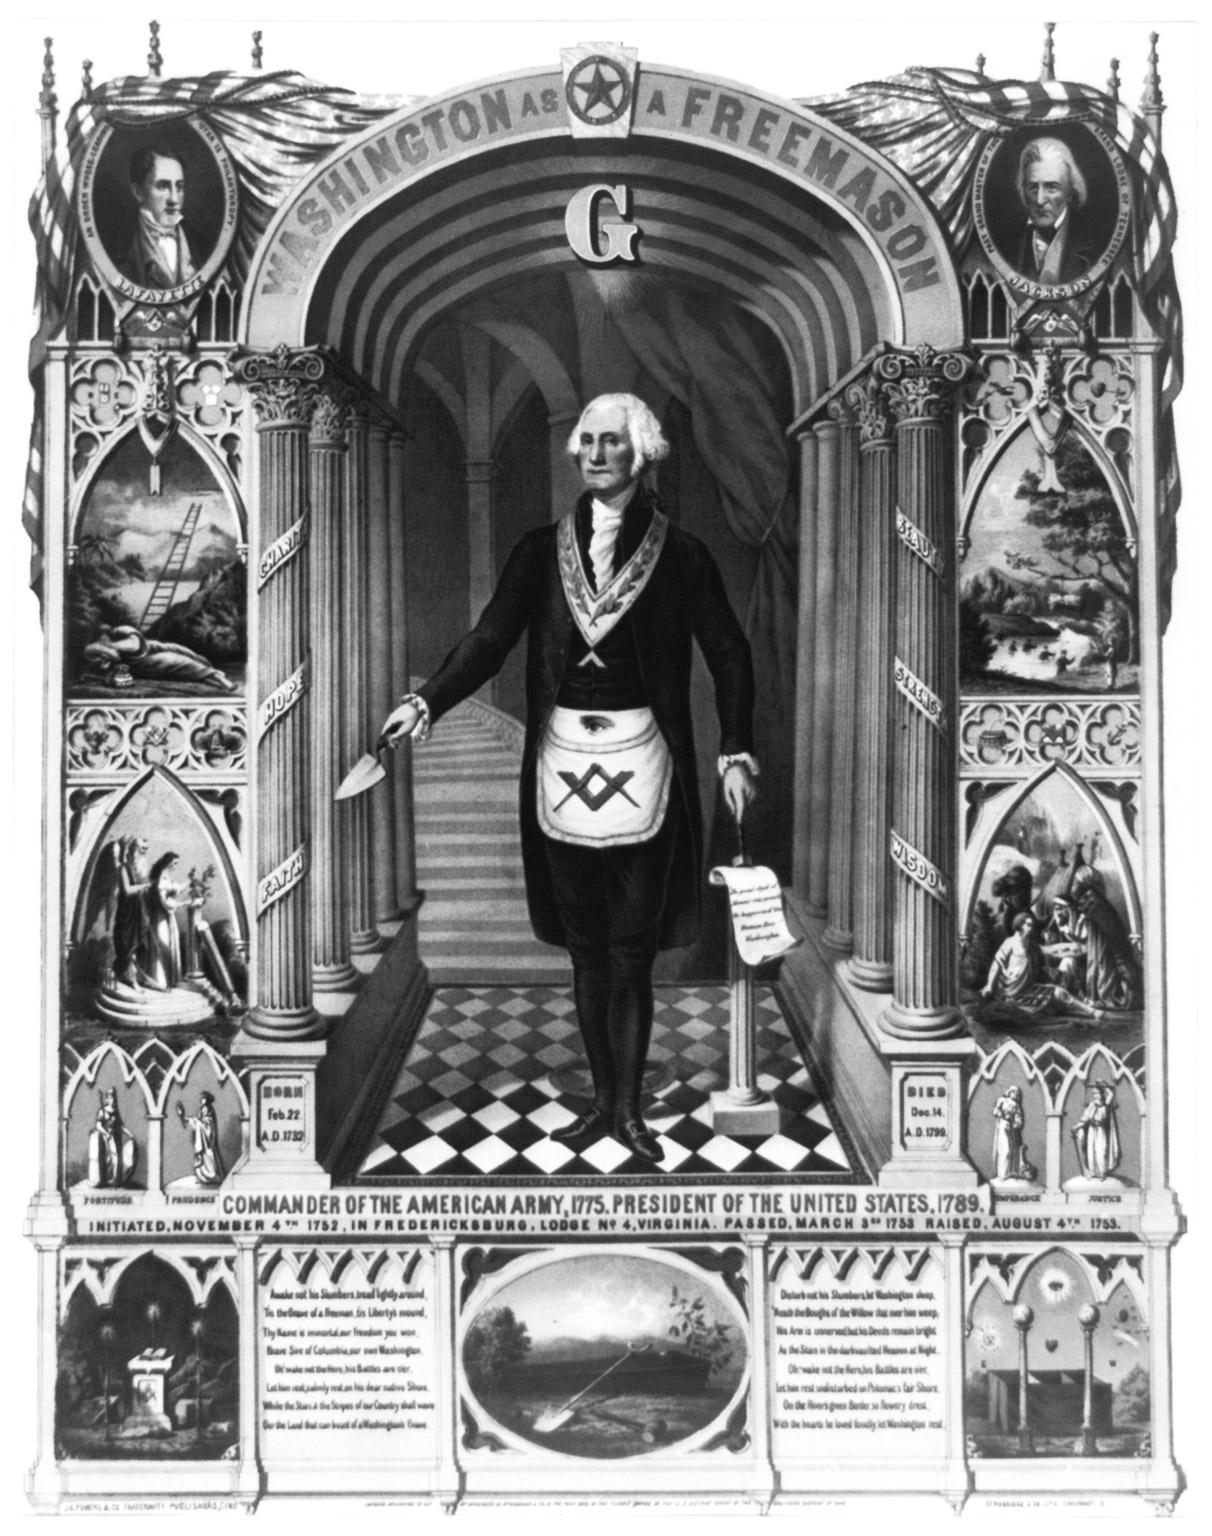 Freemasons george washington desktop 1212x1536 hd wallpaper 545987jpg 1212x1536